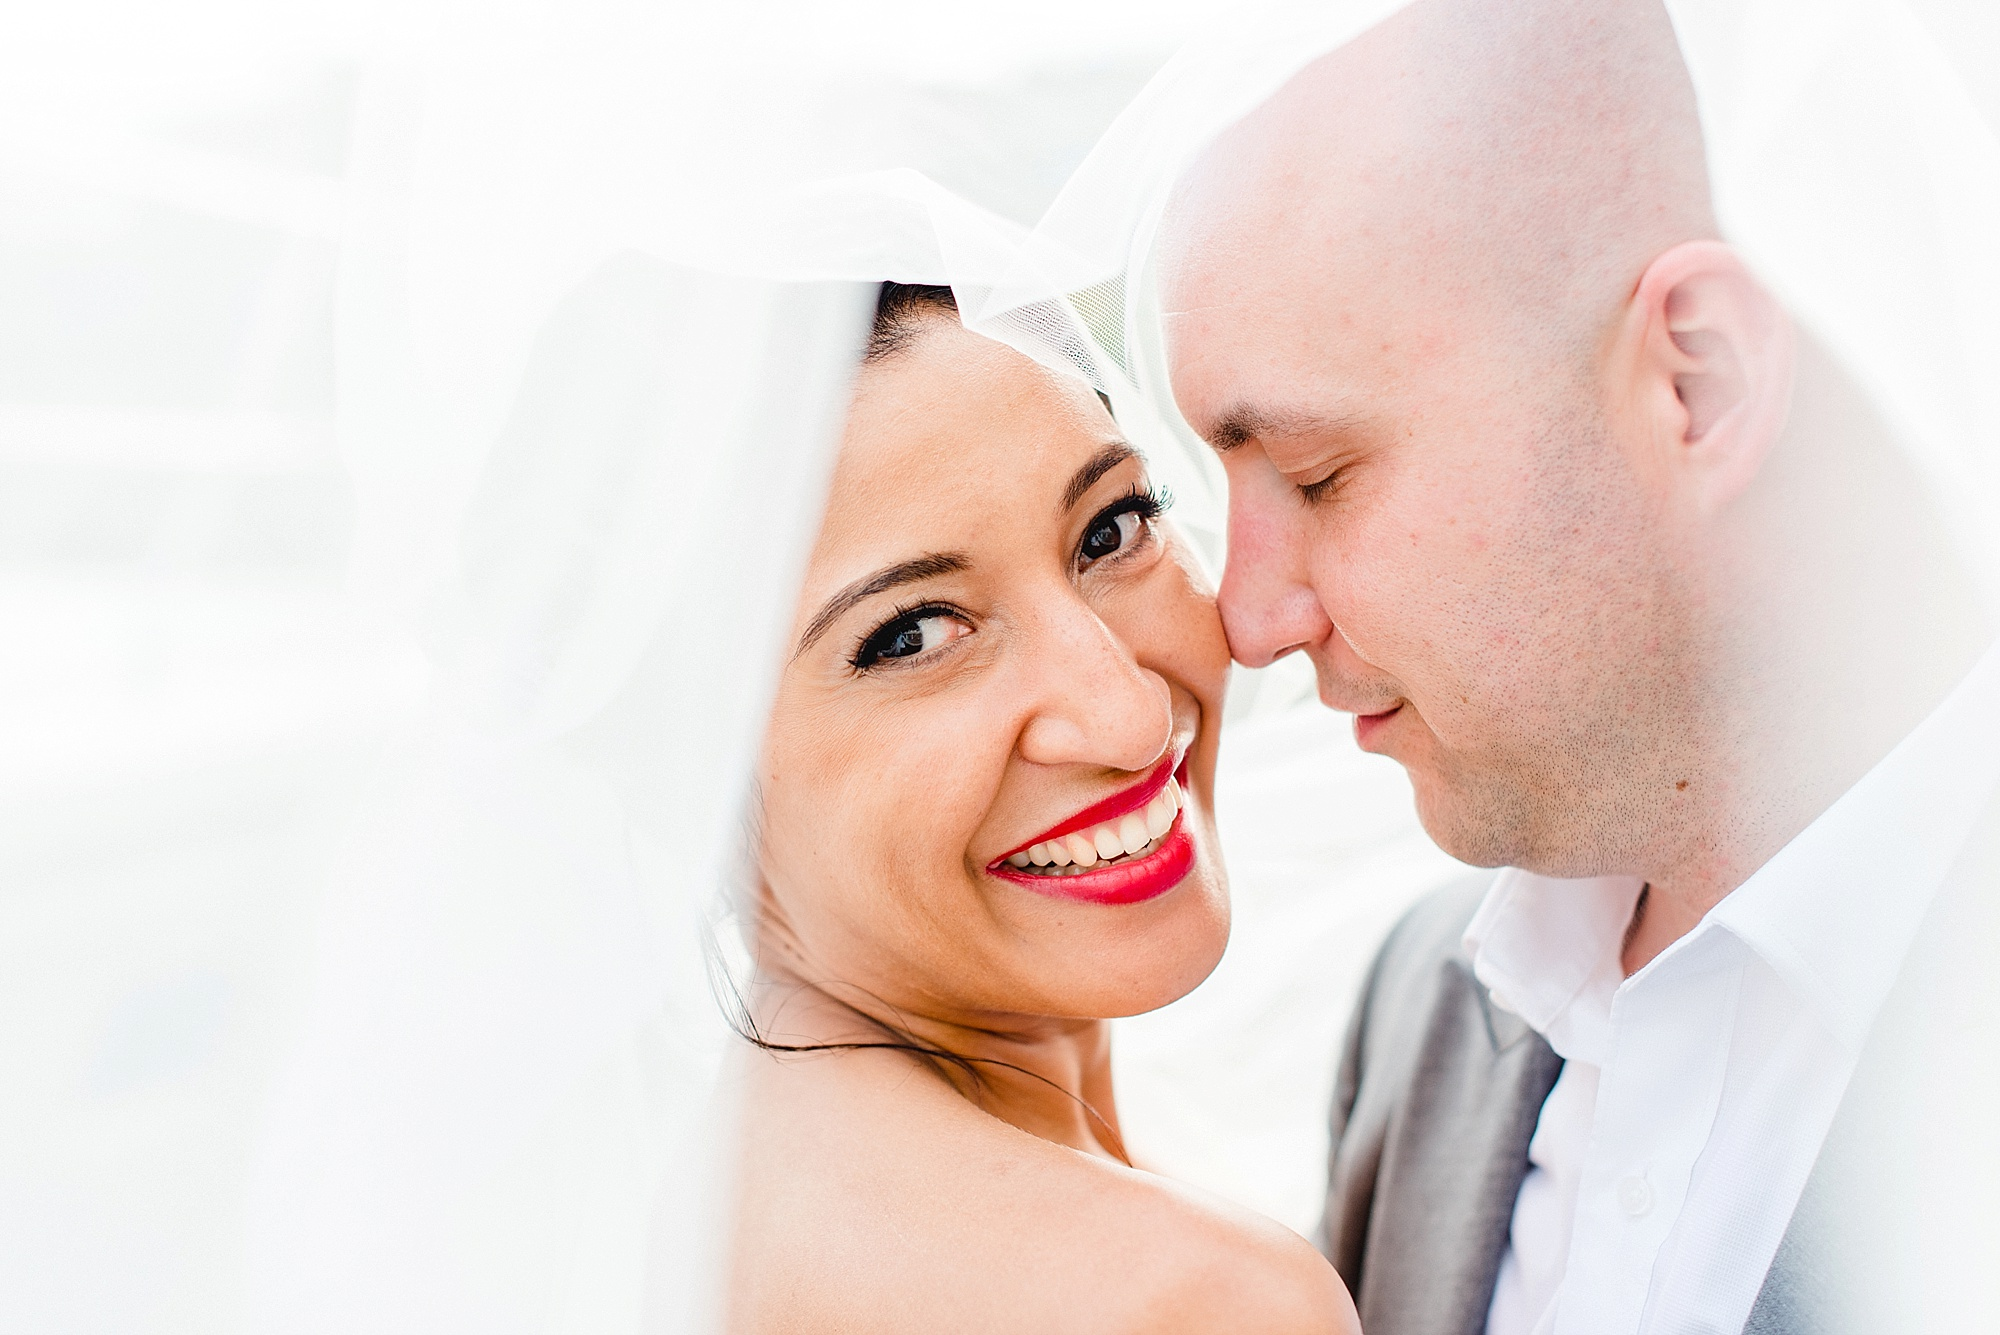 Darren-Bester-Cape-Town-Wedding-Photographer-Nicky-Orce.jpg